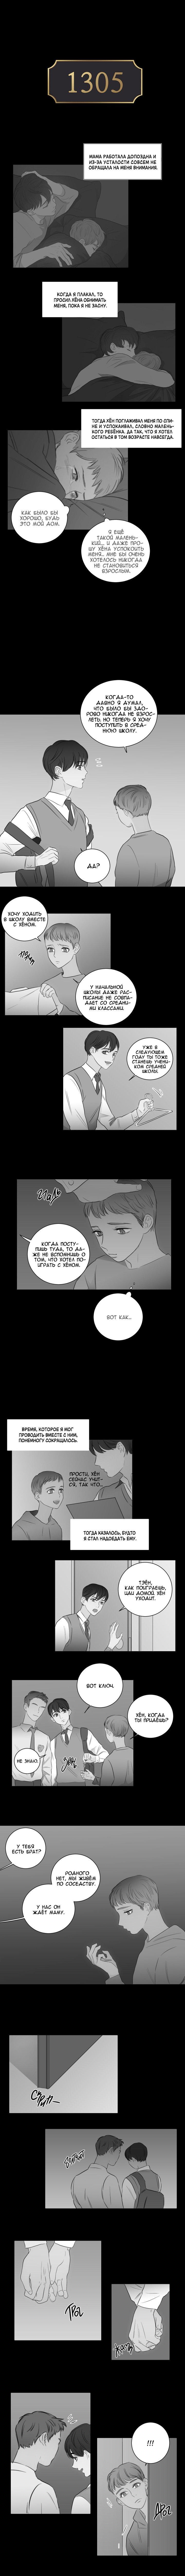 Манга 1305 - Глава 16 Страница 1